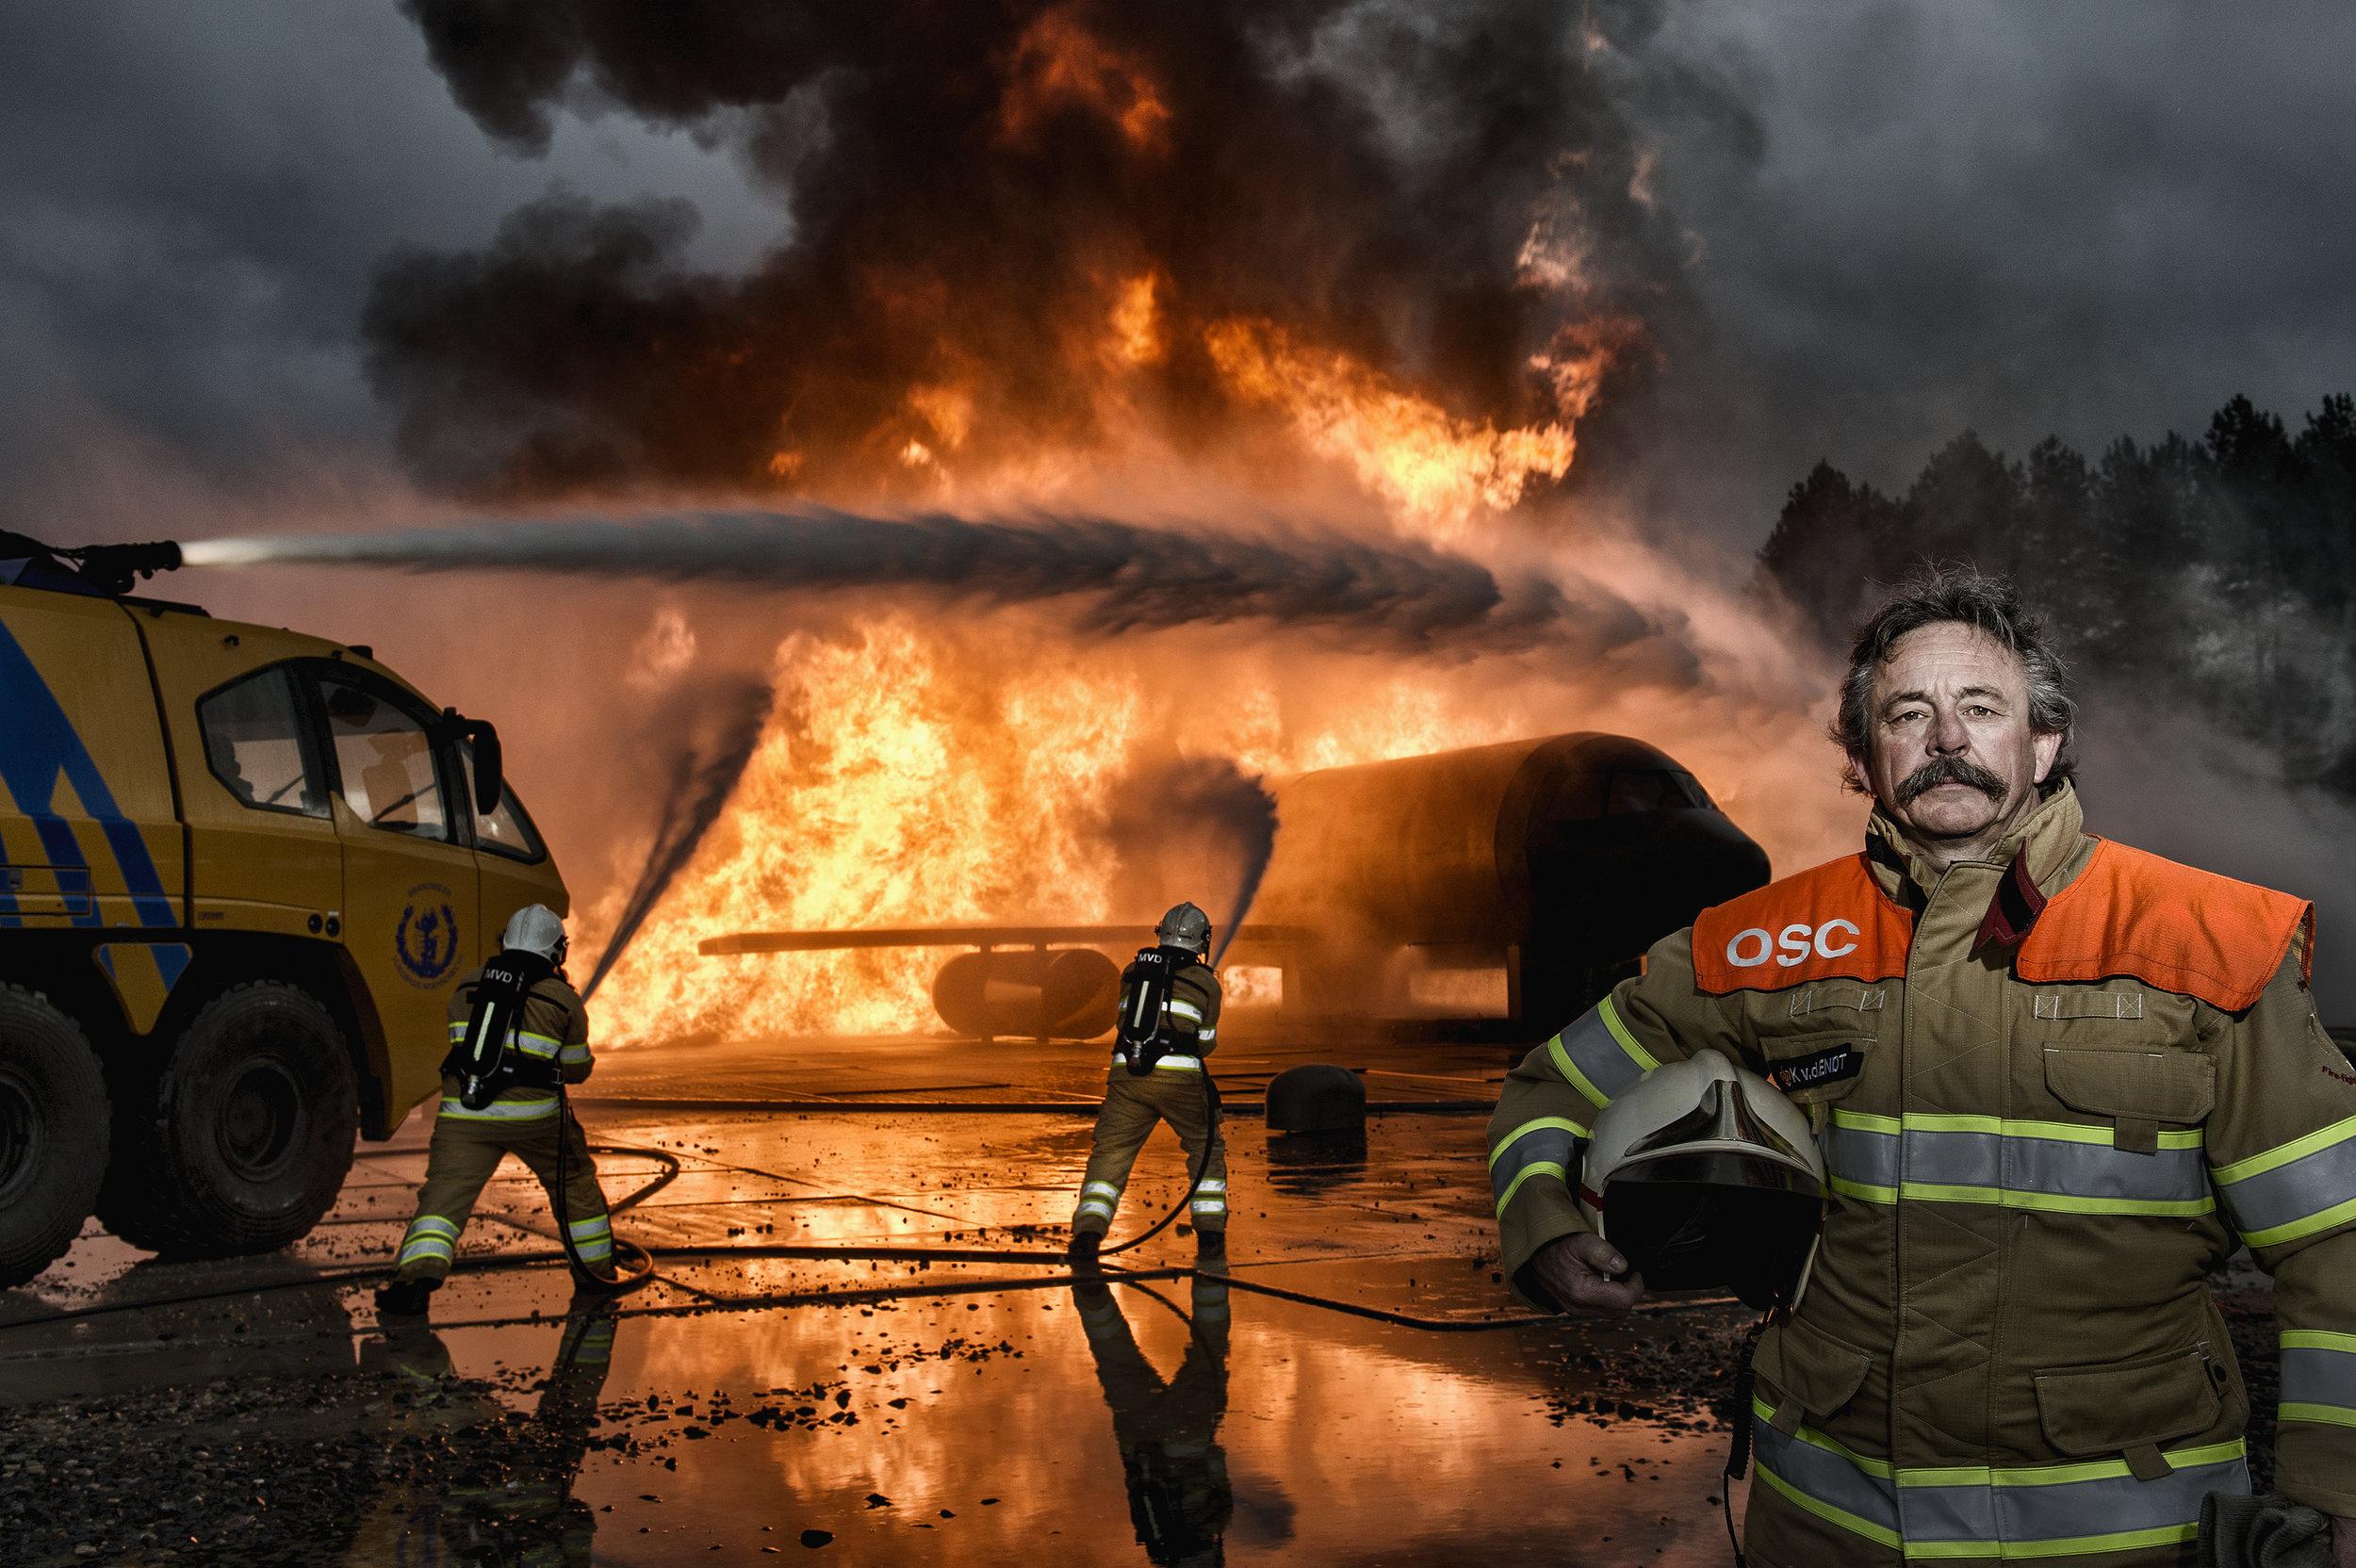 Dutch Army Fireman for Dutch Ministry of Defense